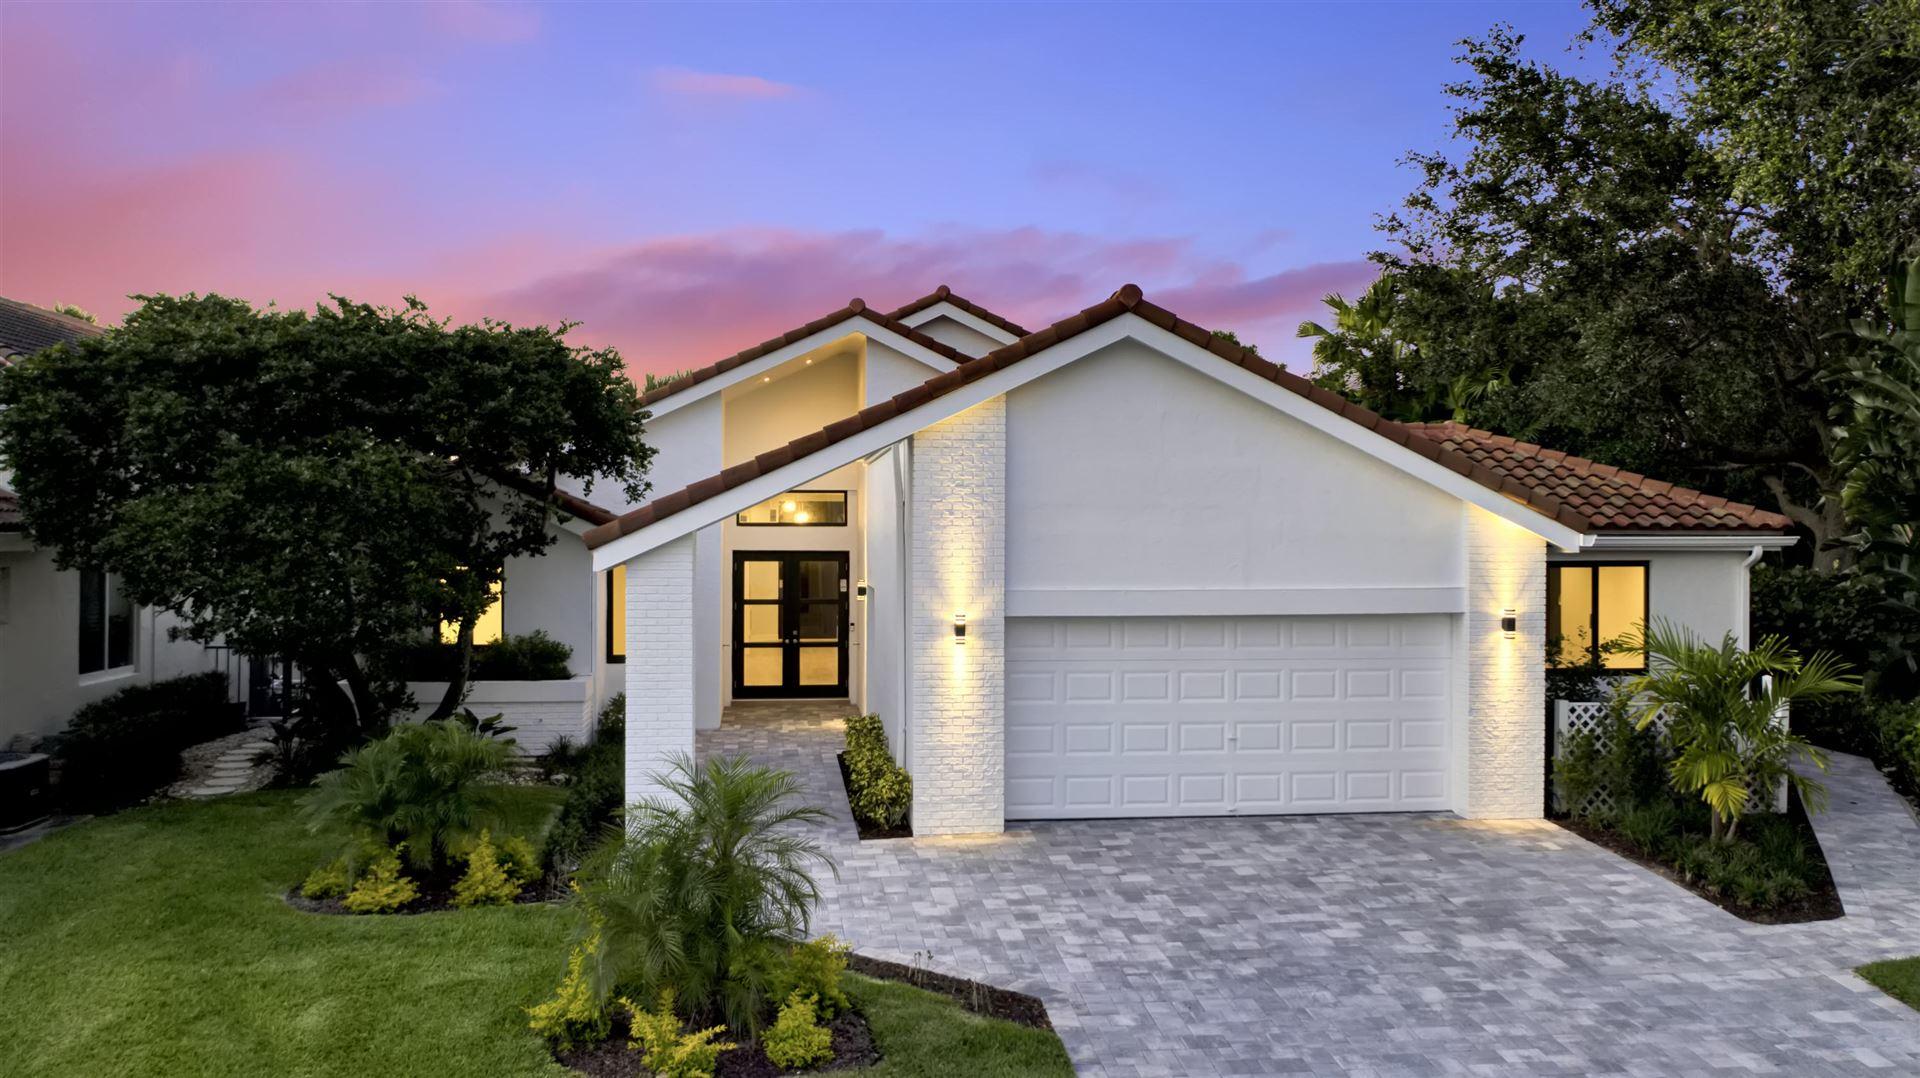 Photo of 13232 Provence Drive, Palm Beach Gardens, FL 33410 (MLS # RX-10621114)